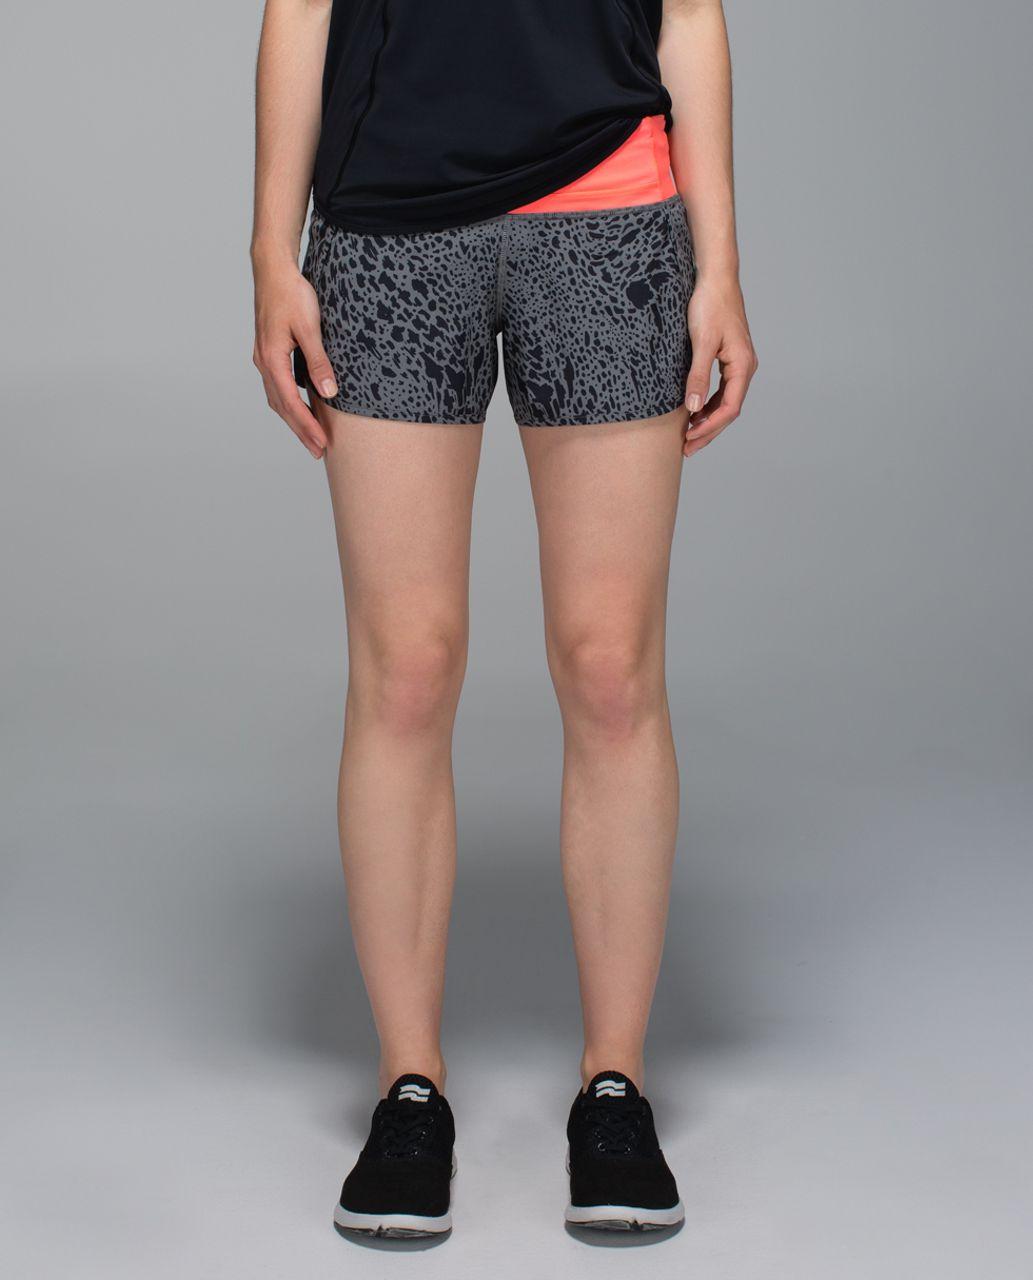 Lululemon Run Times Short *4-way Stretch - Watermark Slate Black / Grapefruit